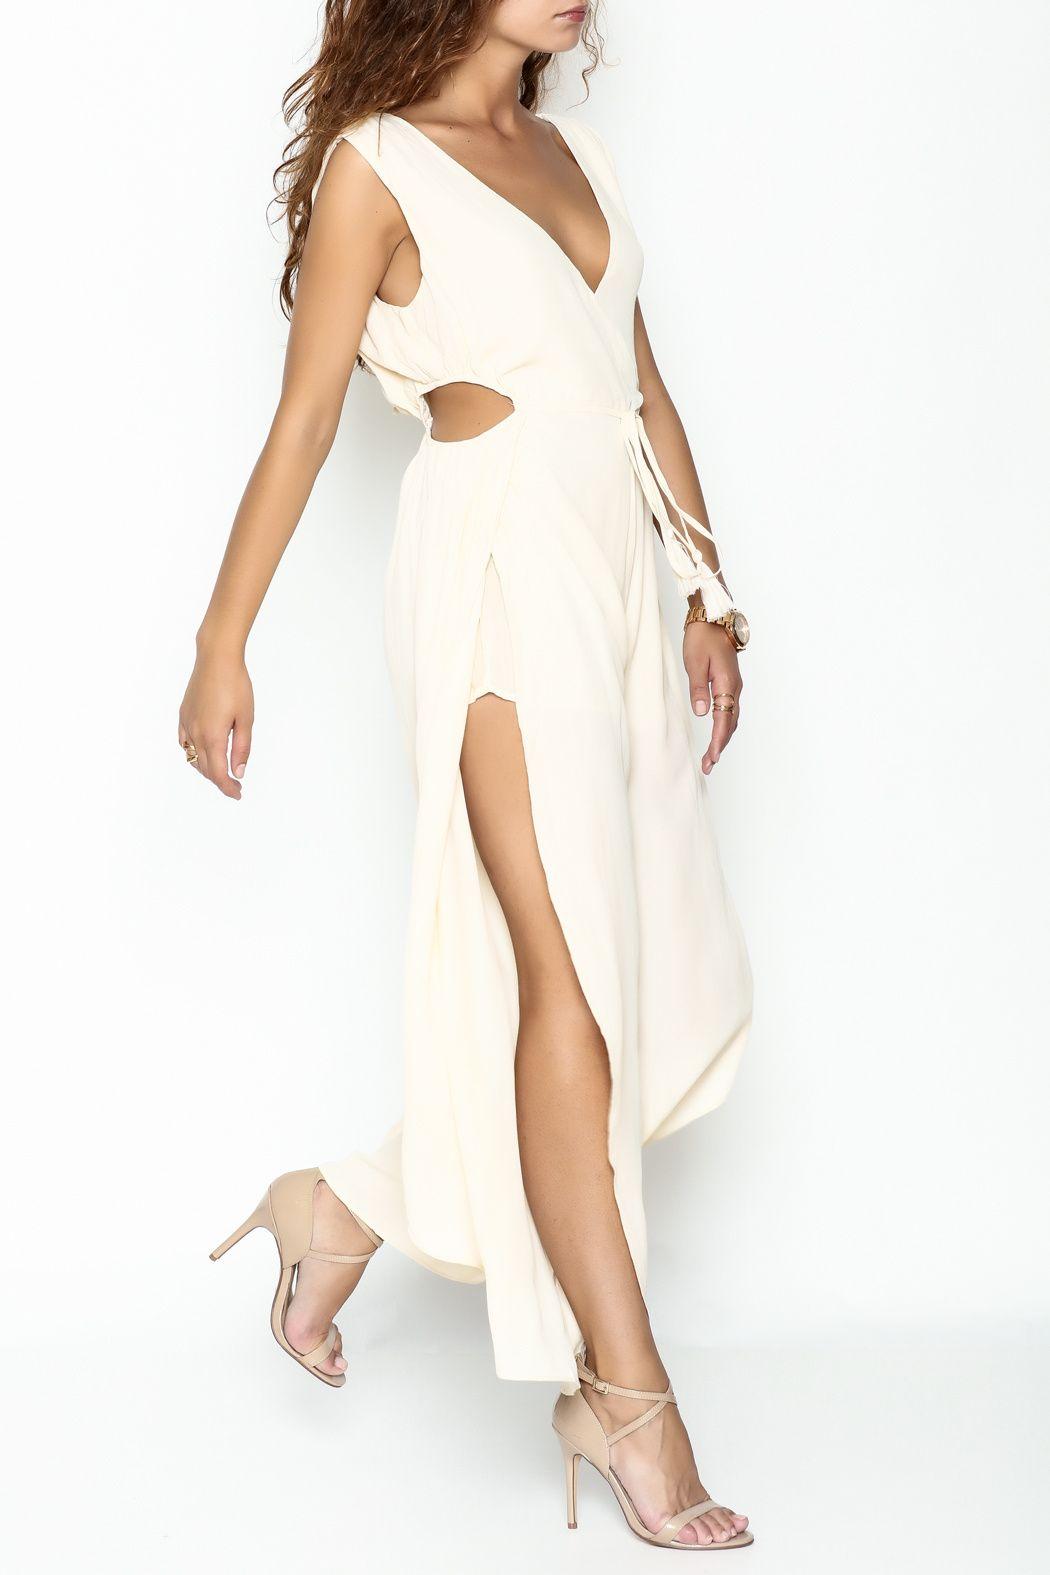 Honey belle open leg jumpsuit legs belle and tassels